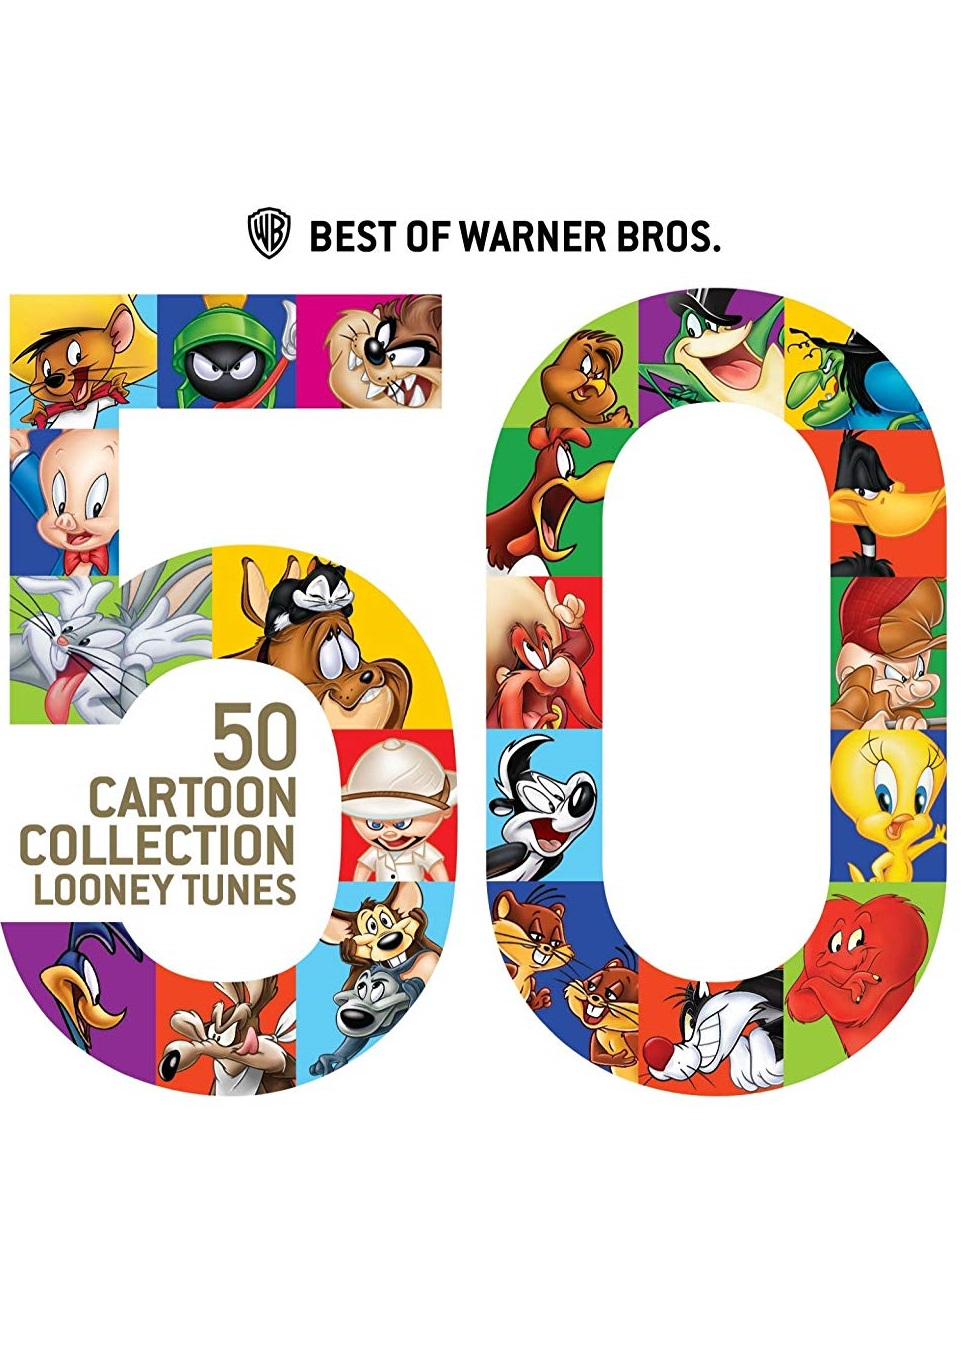 Best of Warner Bros. 50 Cartoon Collection : Looney Tunes [2013] [DVD9] [NTSC] [Latino] [2 DISC]